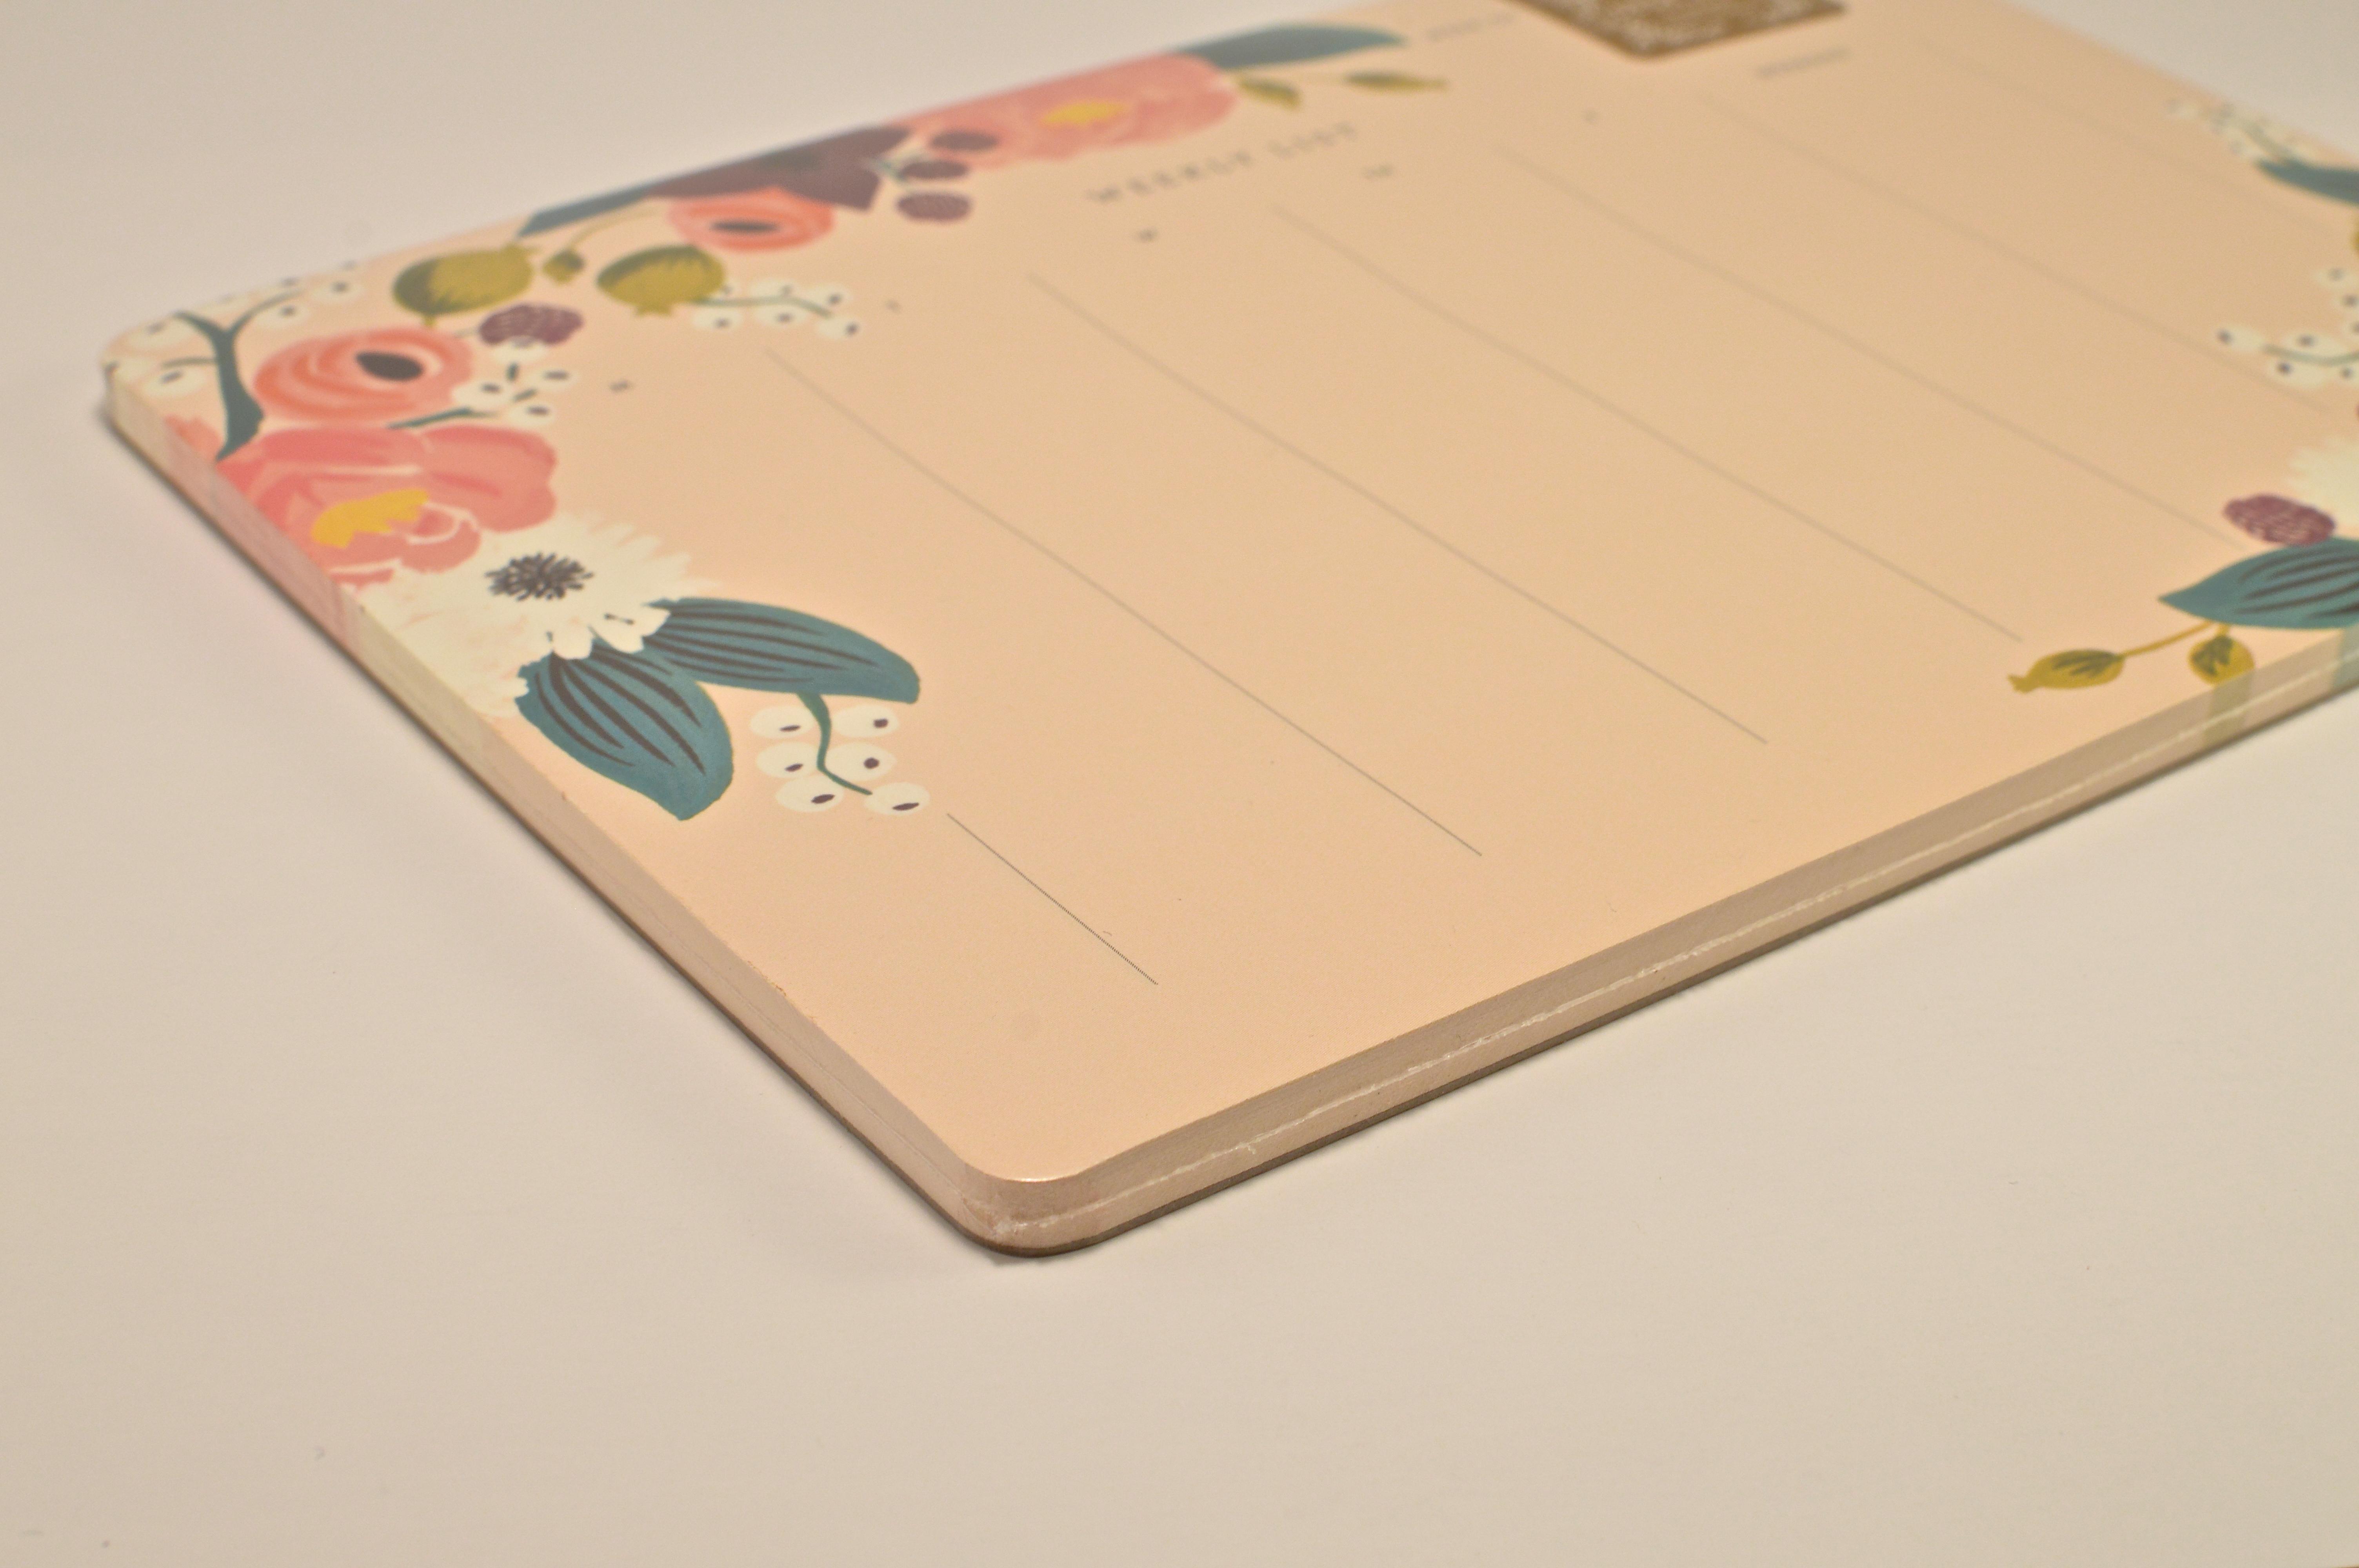 Paper Desk Pad Design Ideas